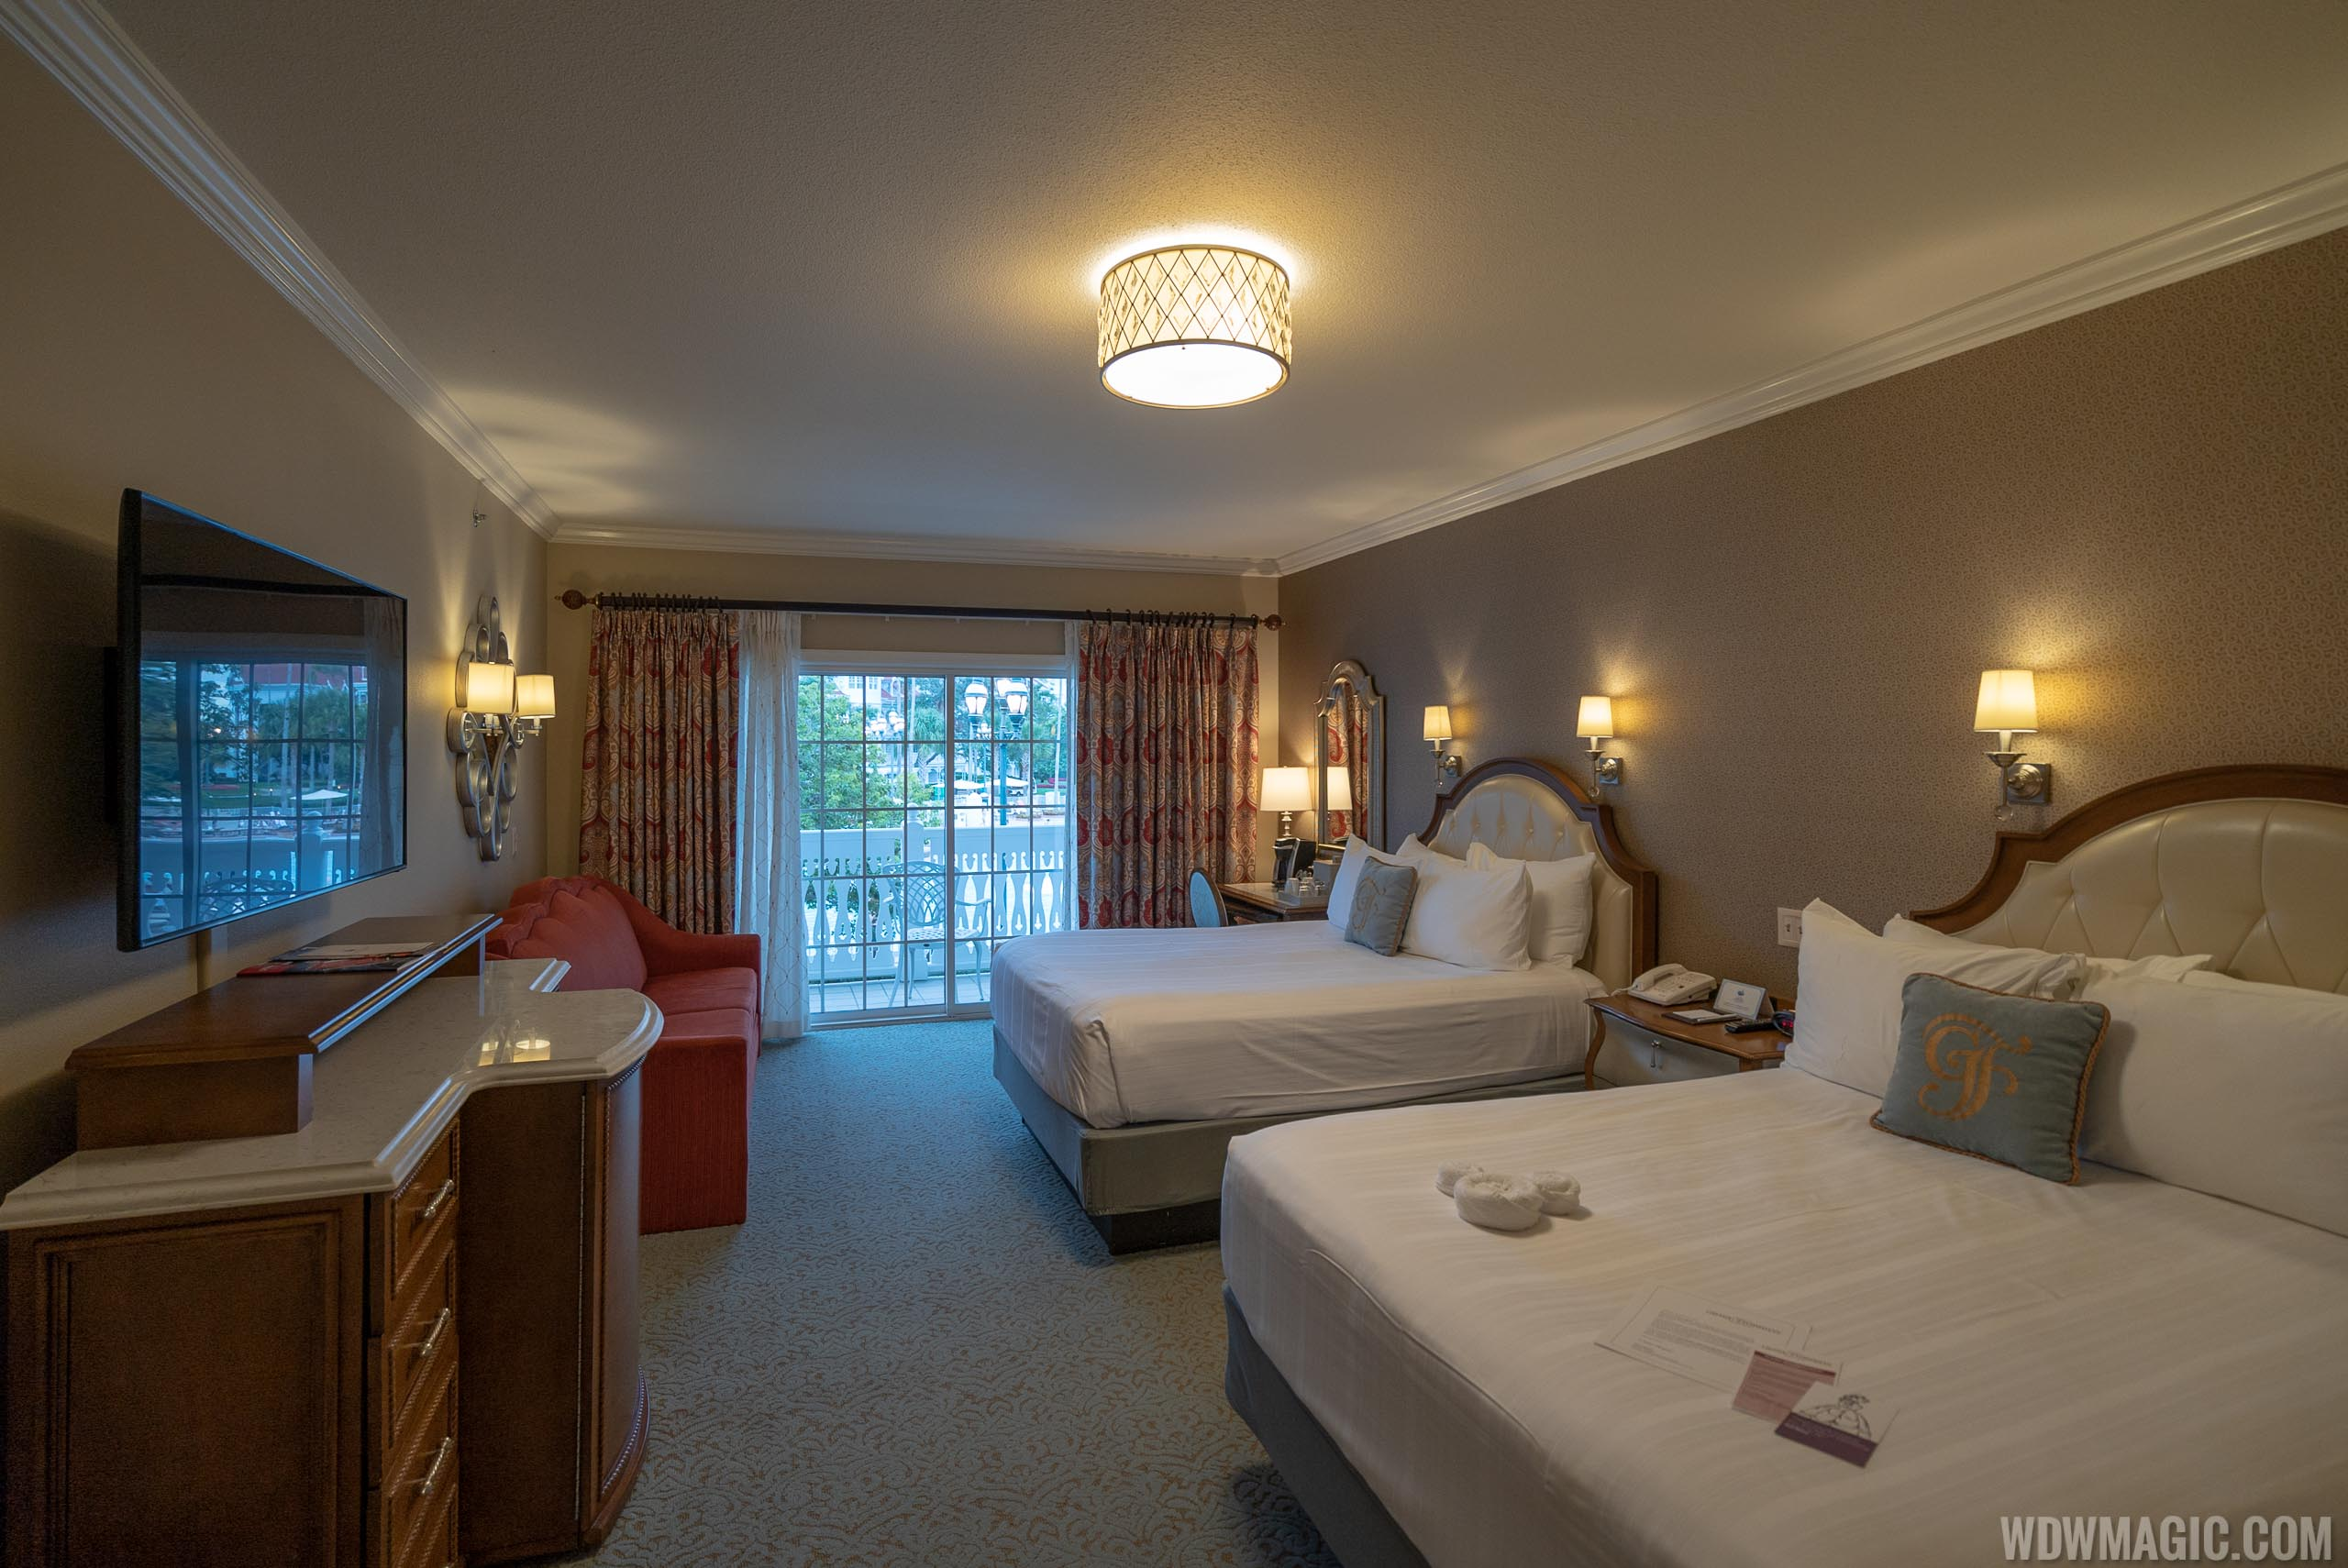 Grand Floridian Resort guest room - Garden View in Big Pine Key building